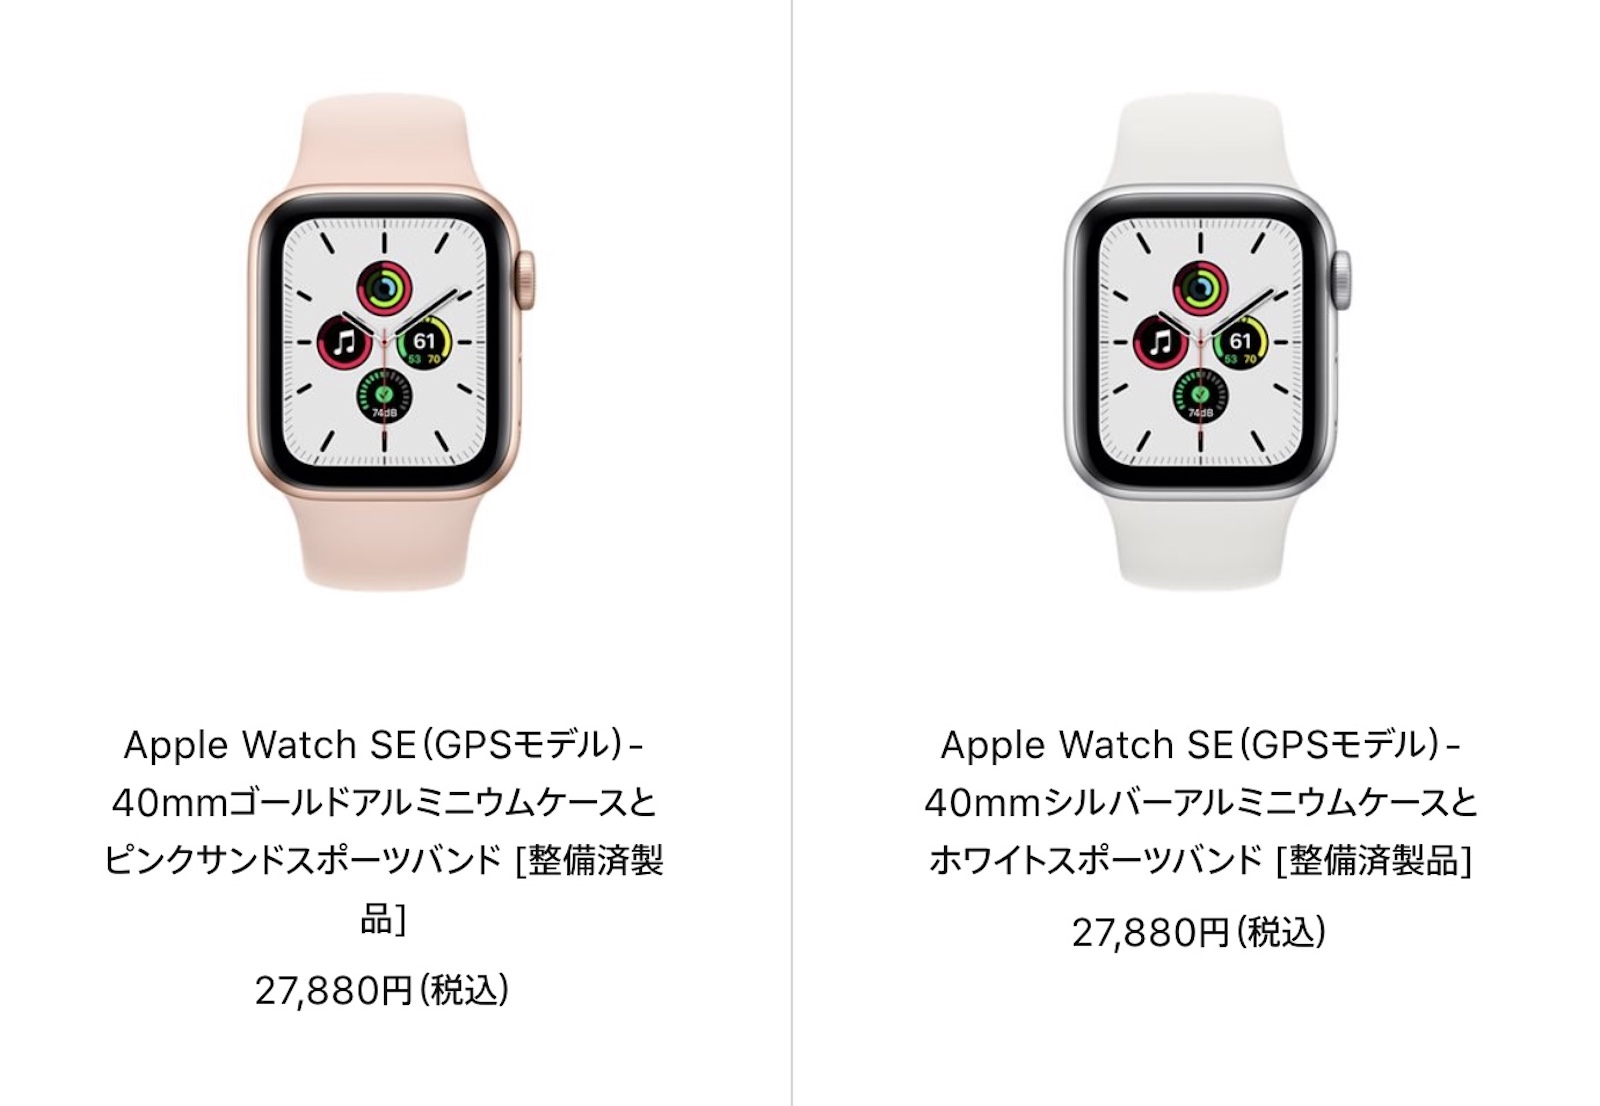 AppleWatch Refurbished model 2021 09 13